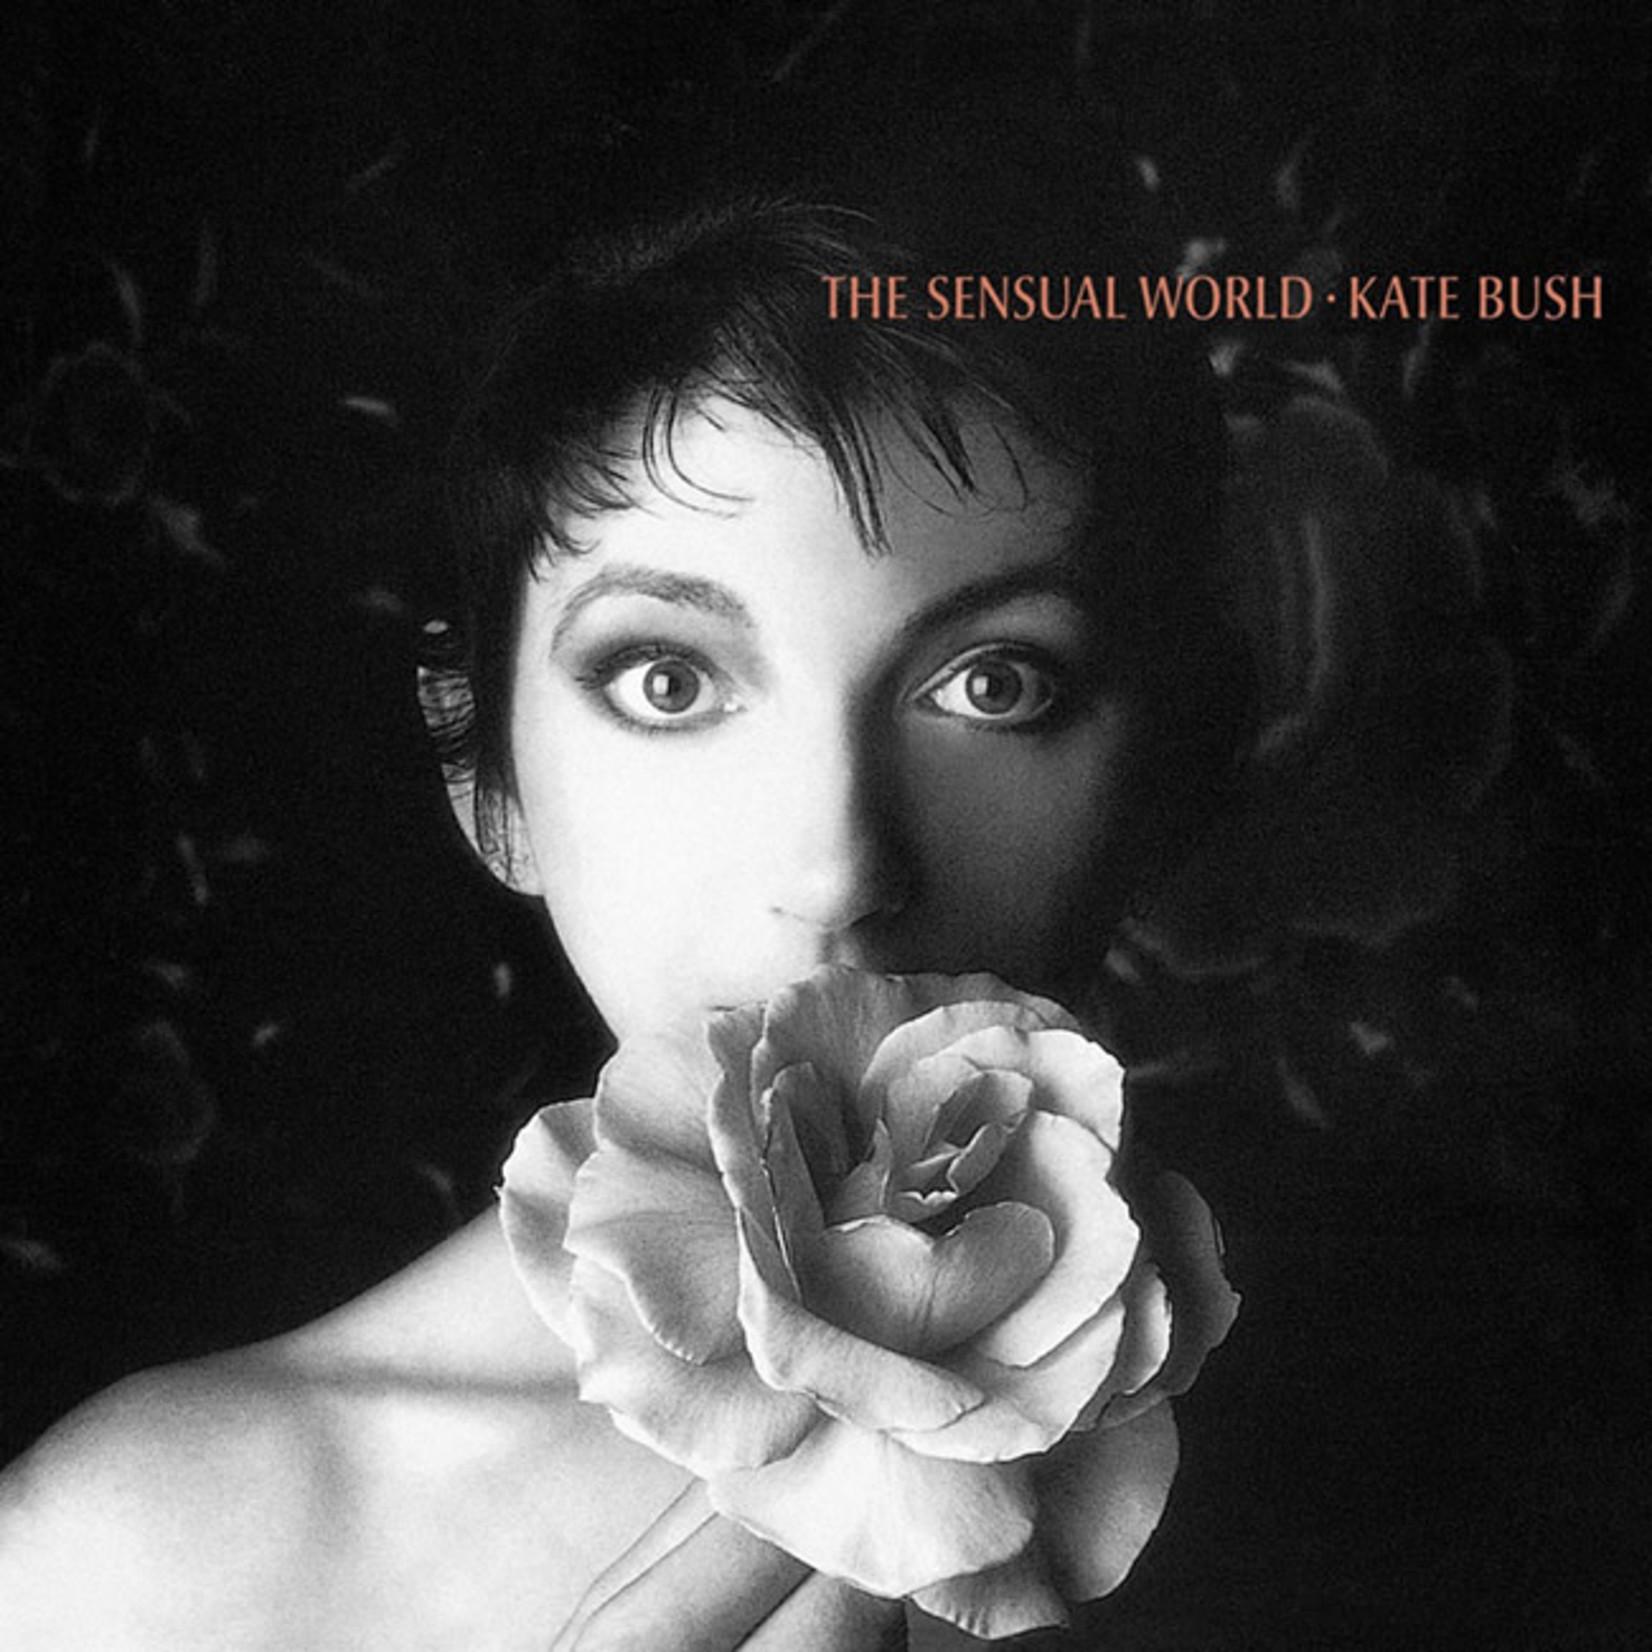 [New] Bush, Kate: The Sensual World (2018 remaster)